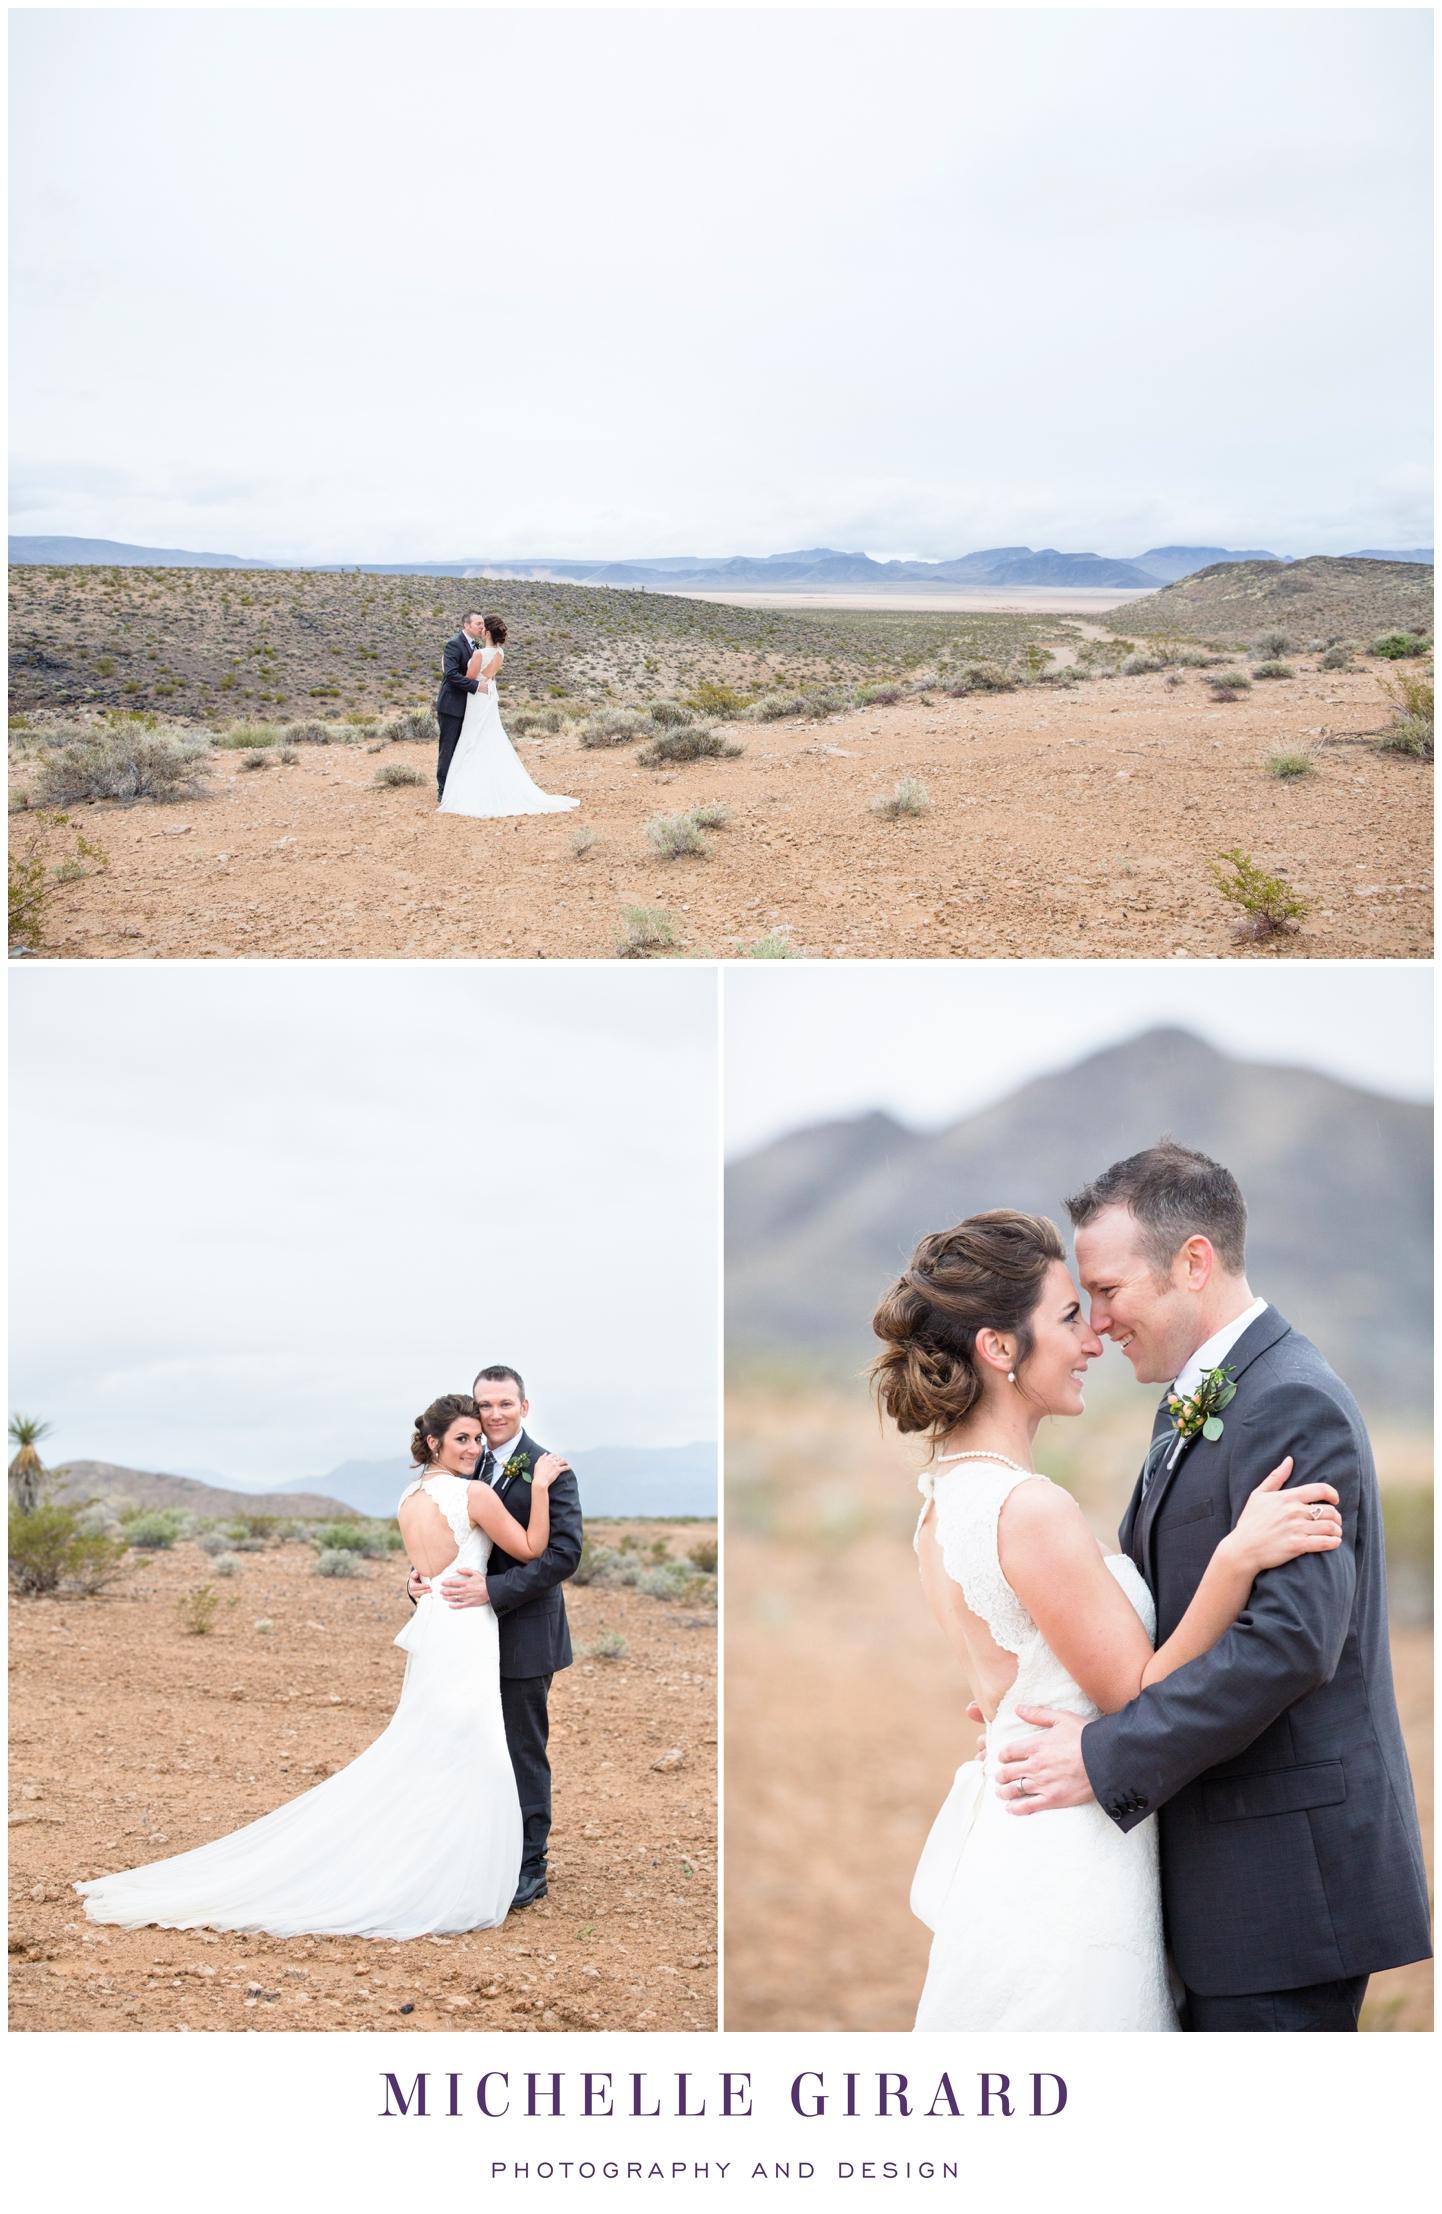 las-vegas-desert-wedding-bride-groom-photography-nevada-michelle-girard-04.jpg